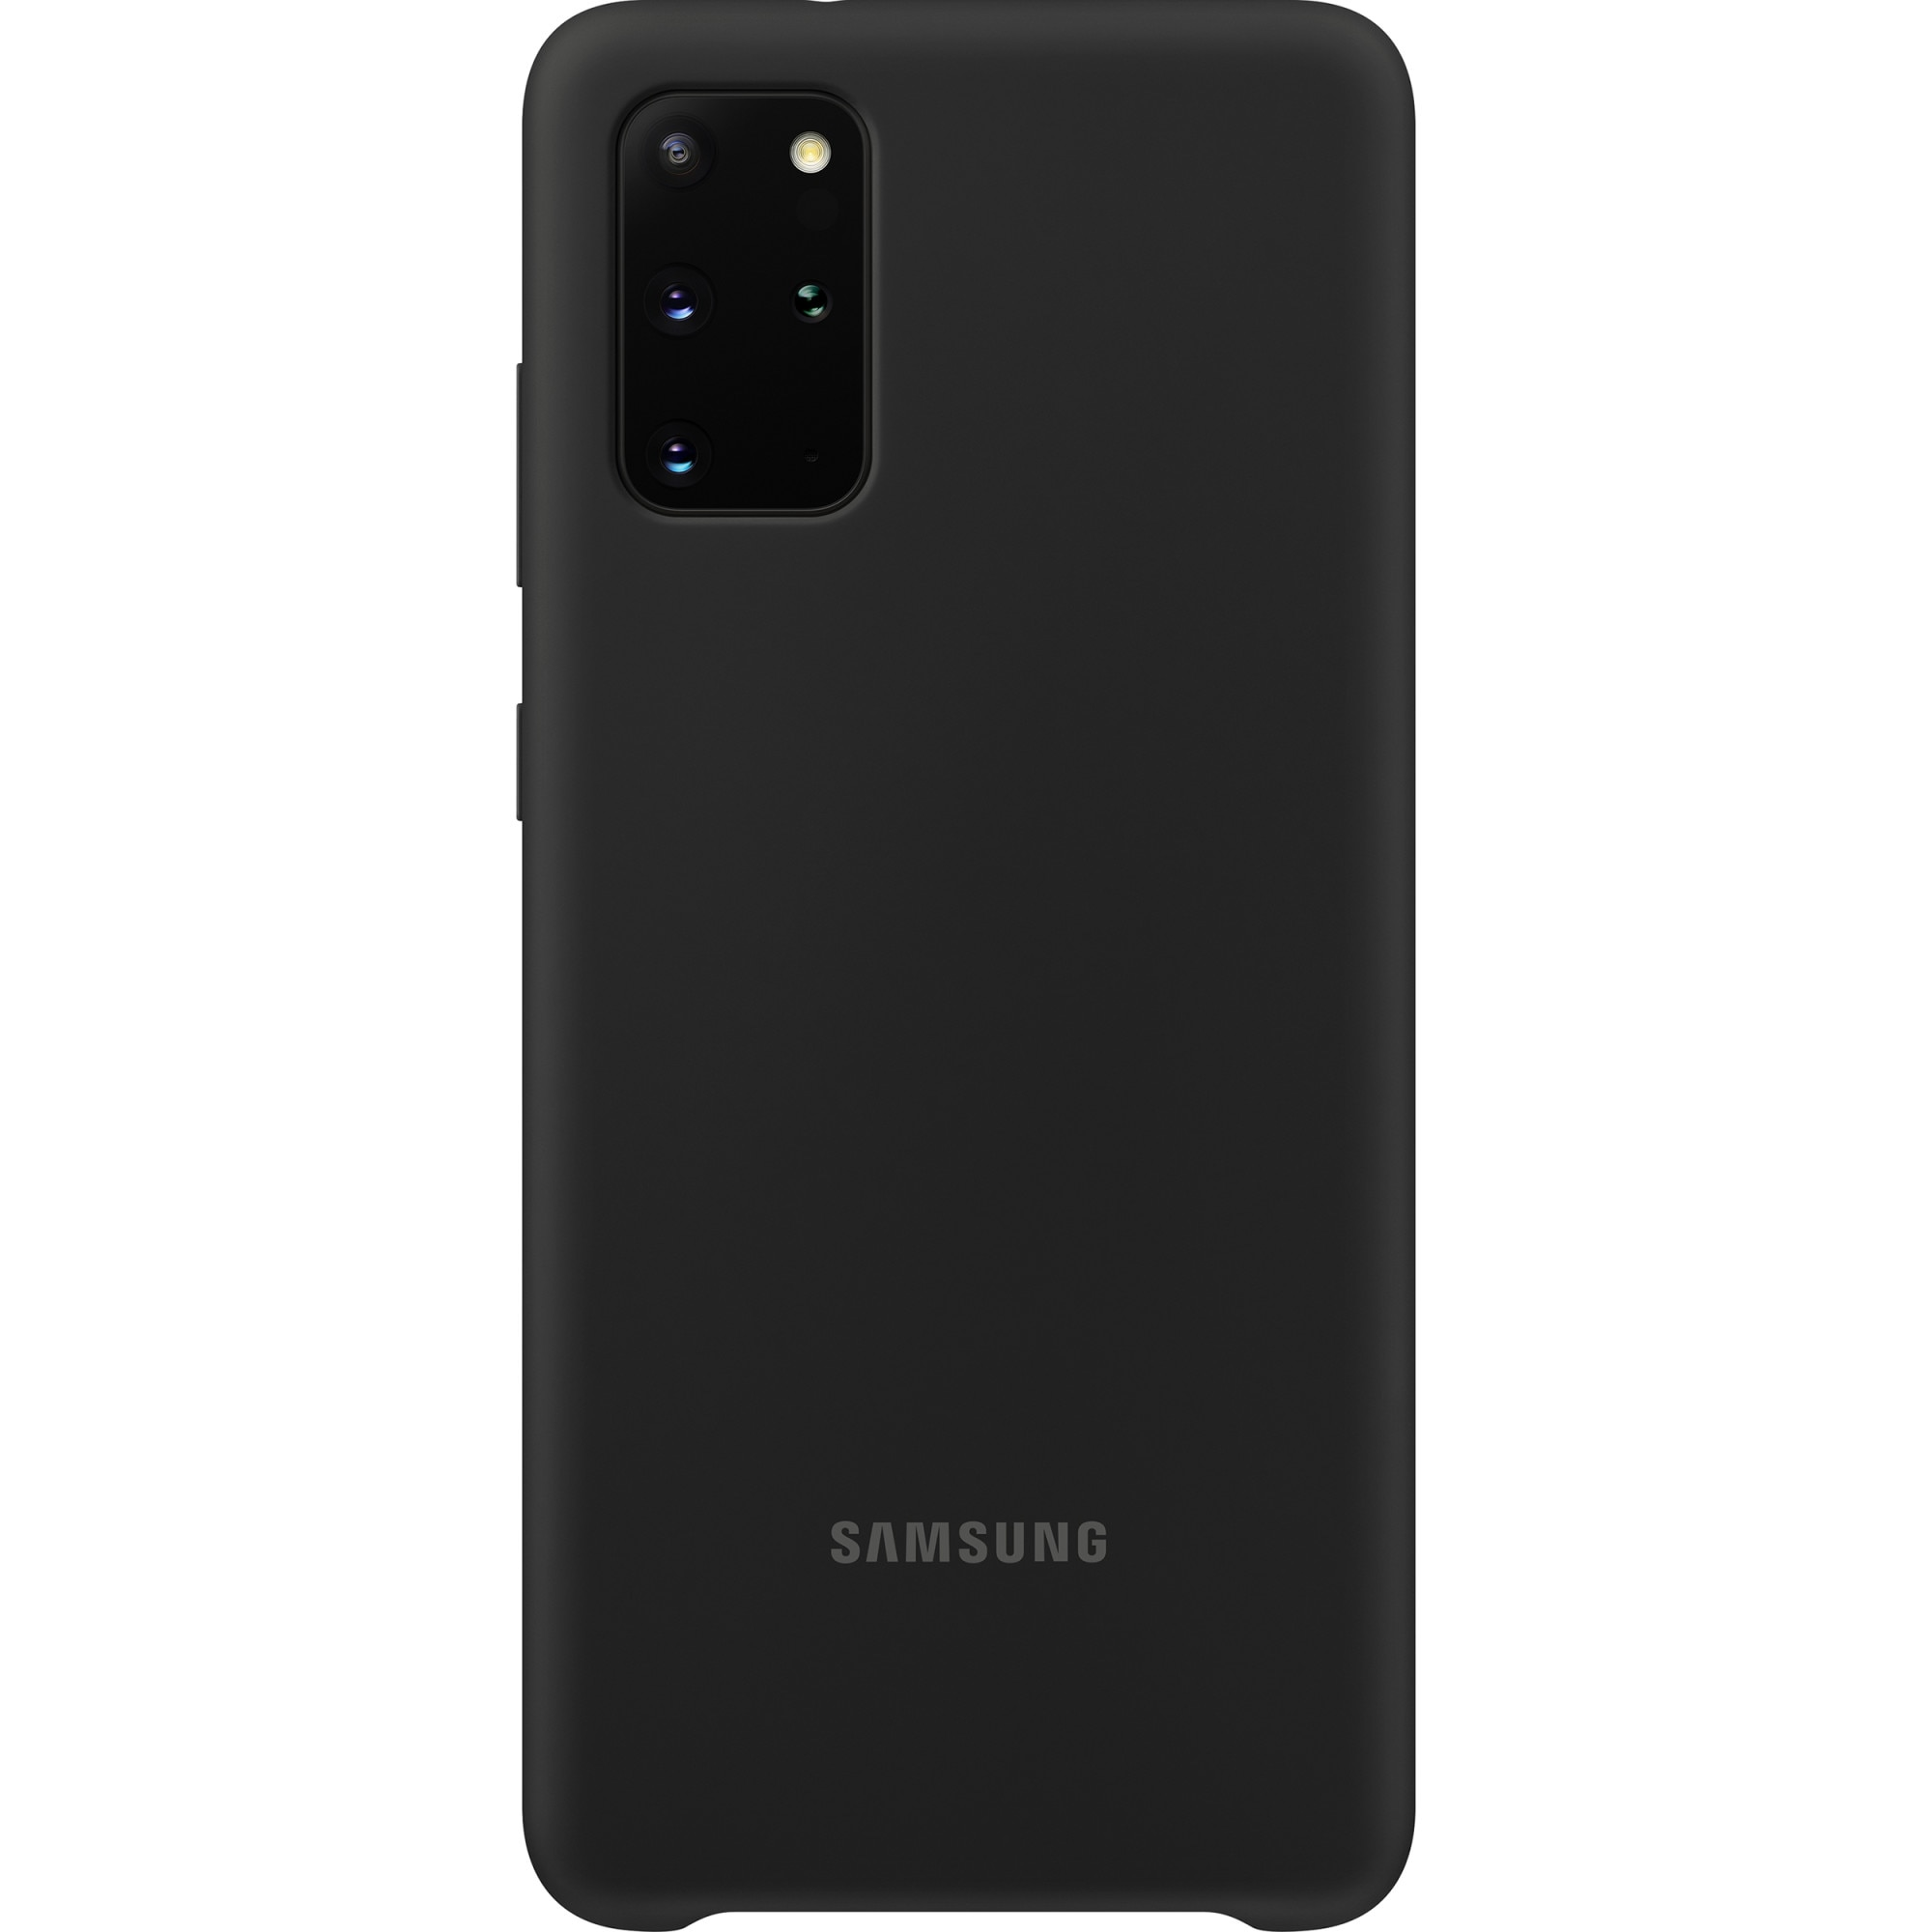 Fotografie Husa de protectie Samsung Silicone Cover pentru Galaxy S20 Plus, Black